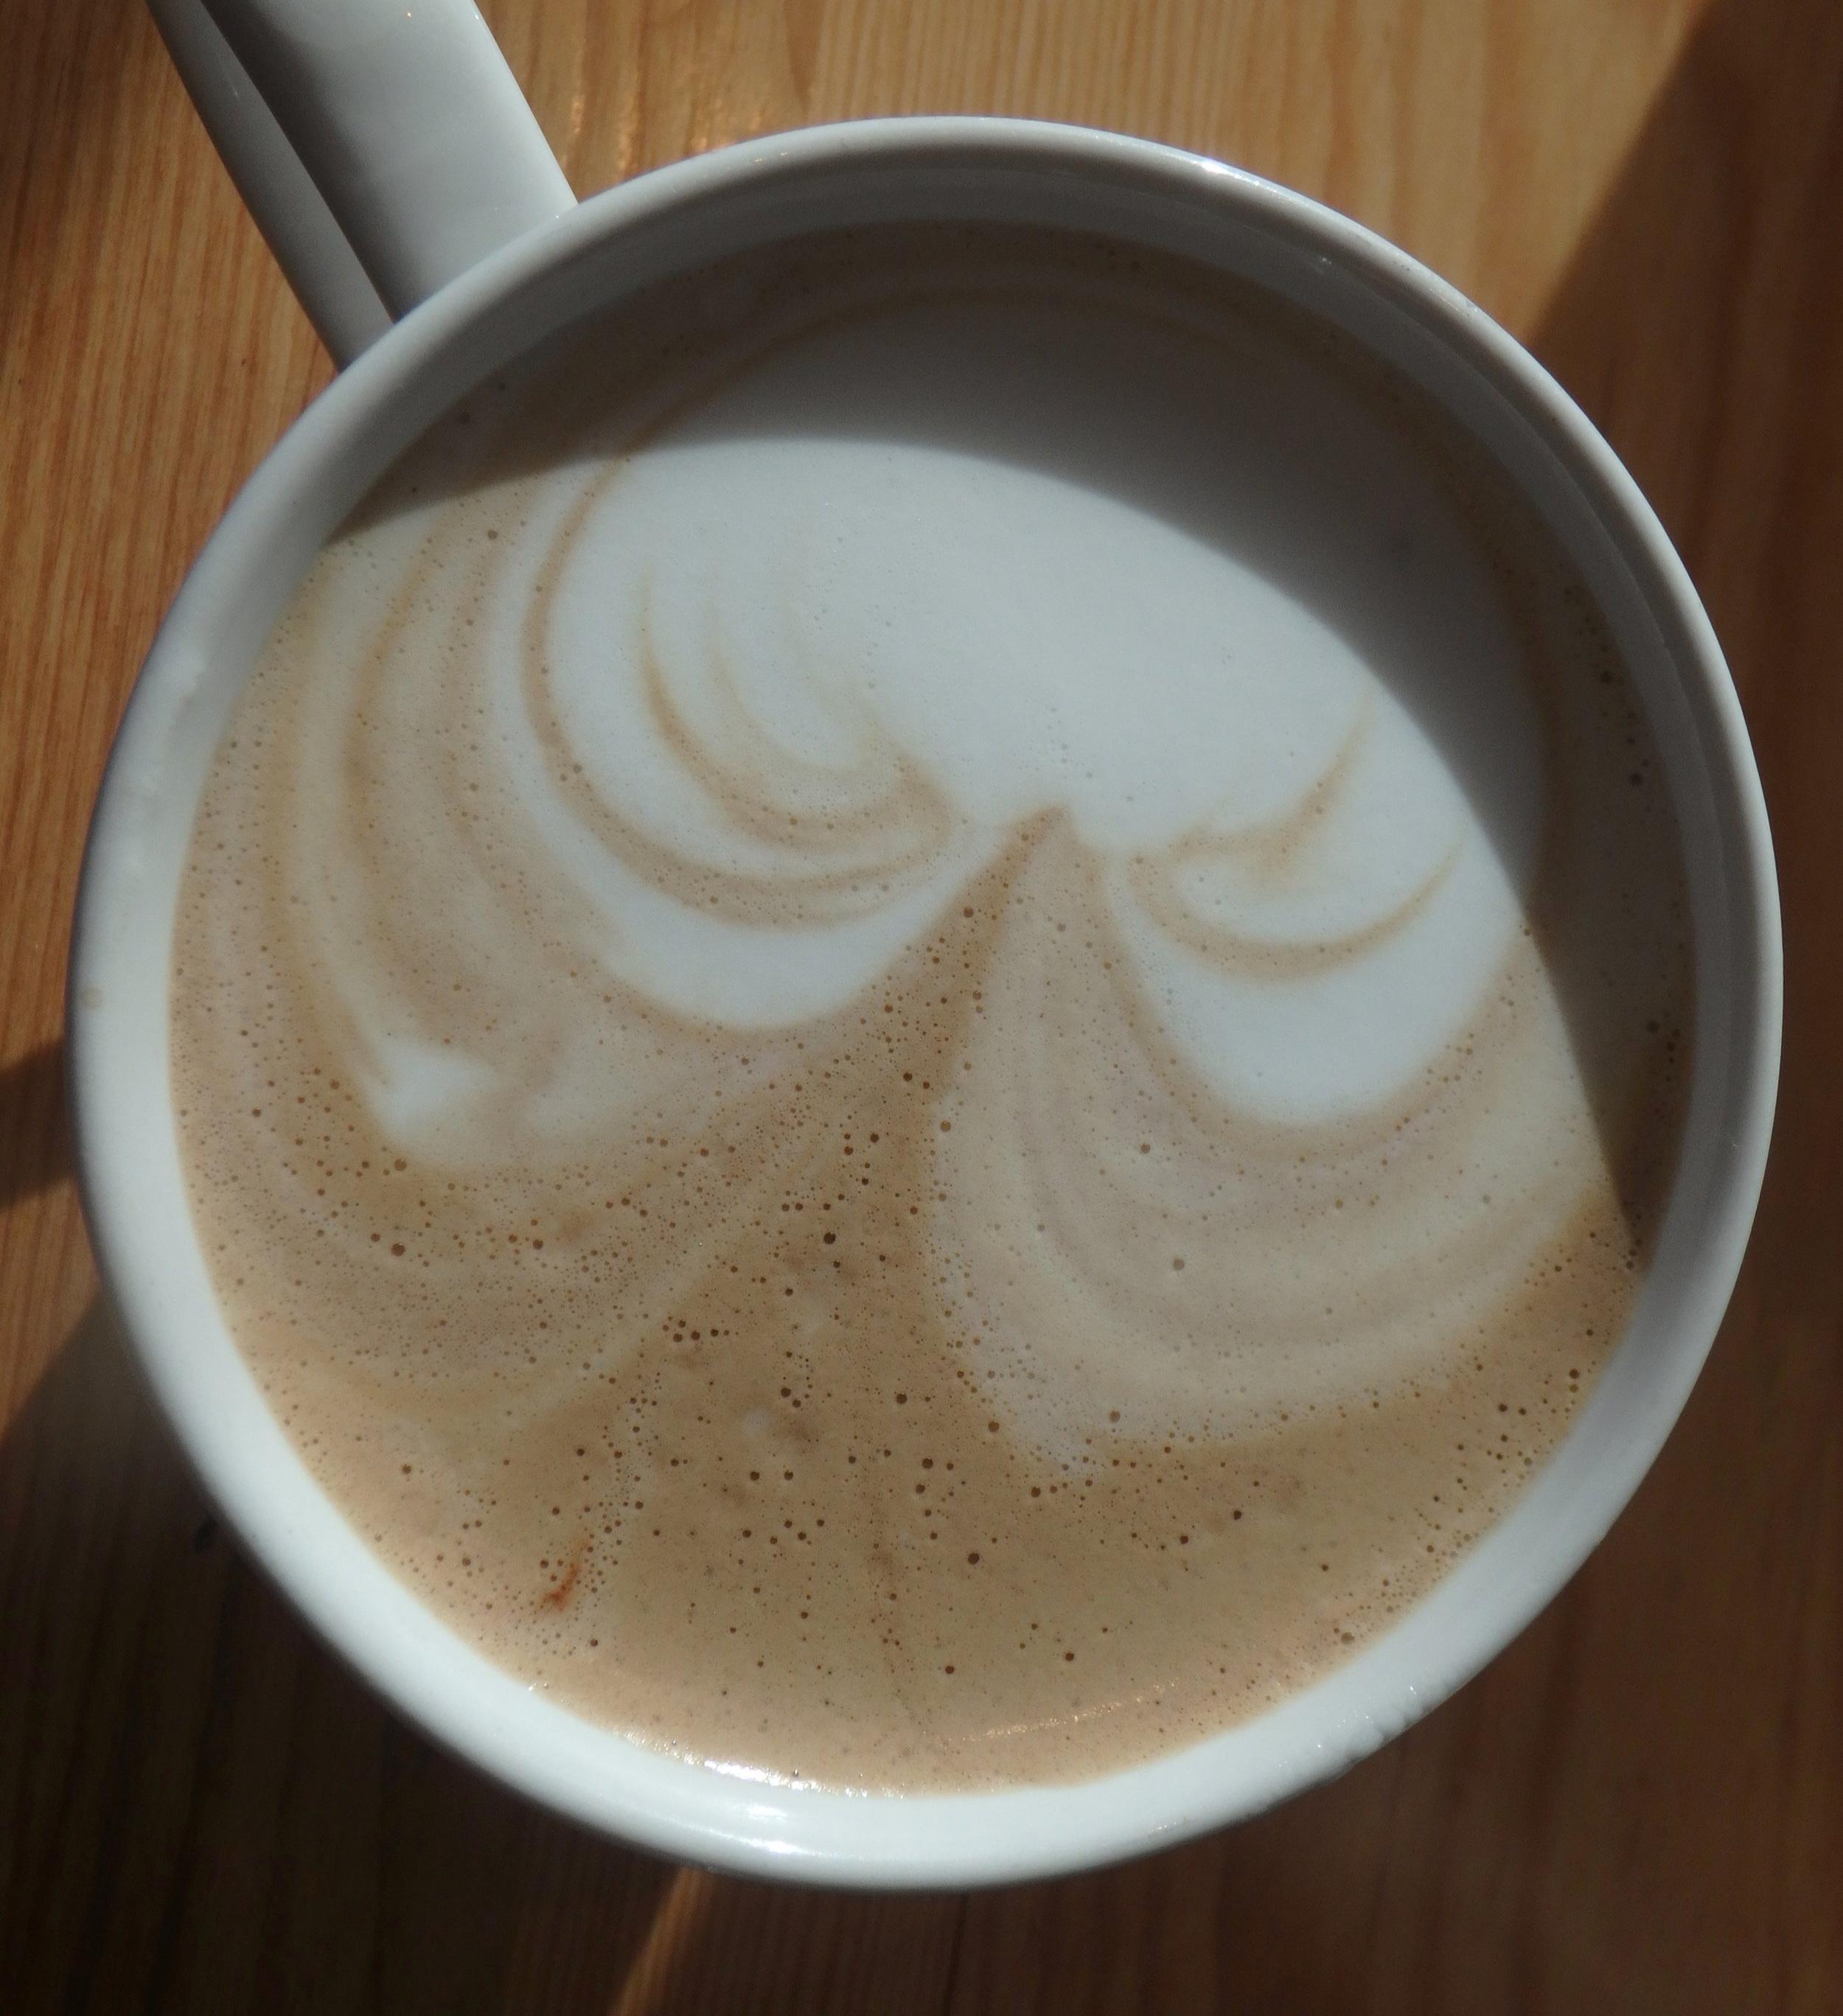 coffeeonwood.jpg